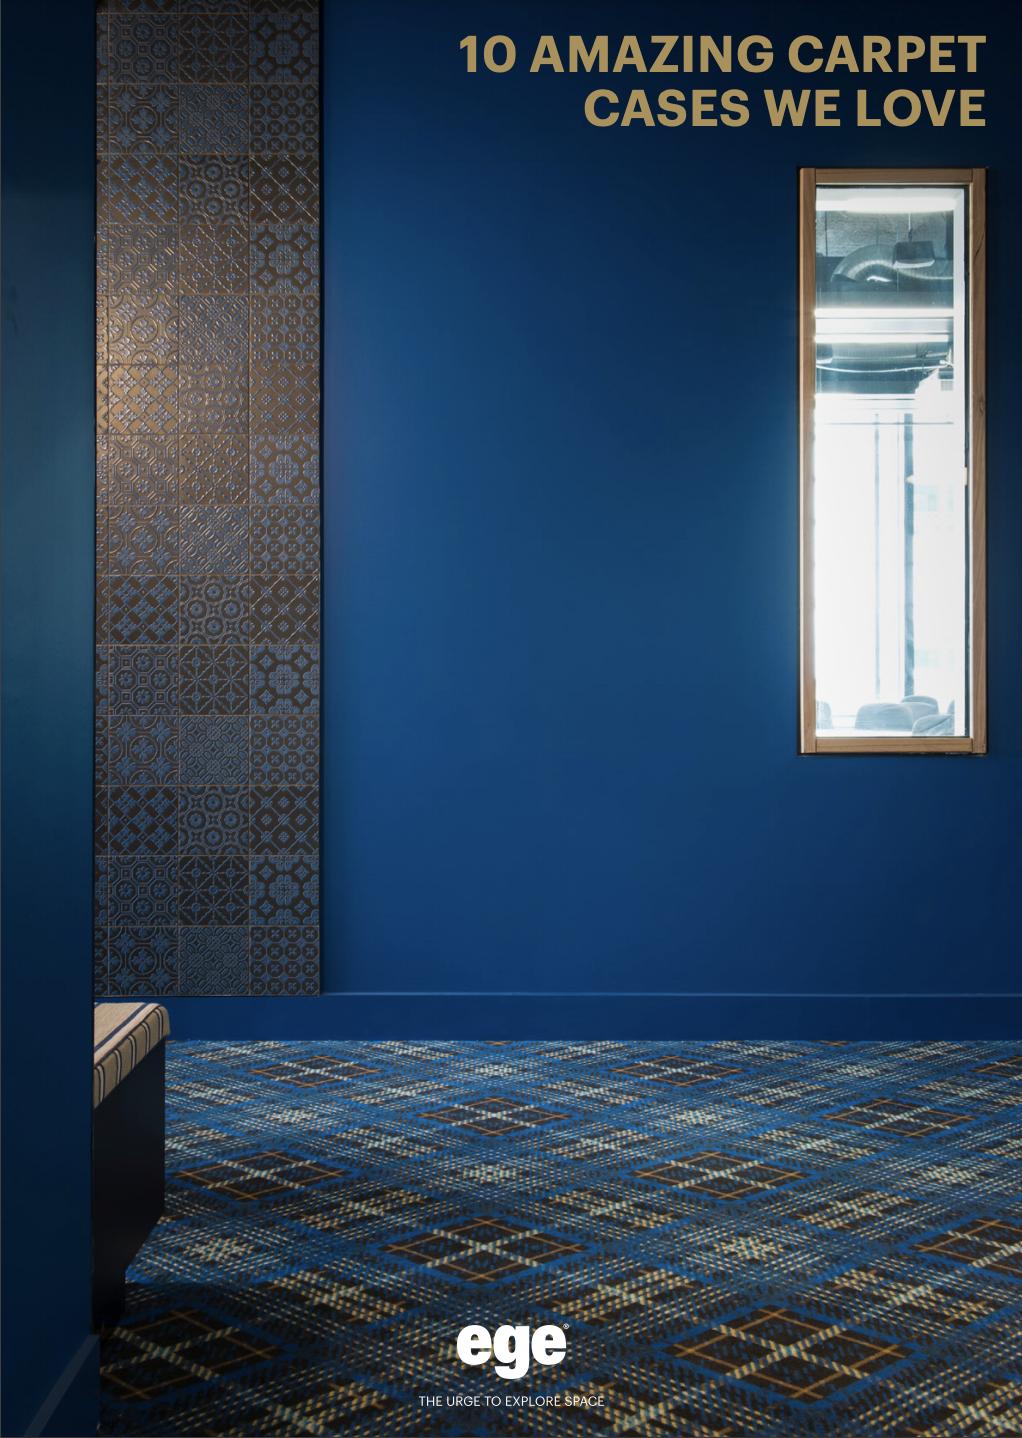 10 Amazing Carpet Cases We Love - 1 - en